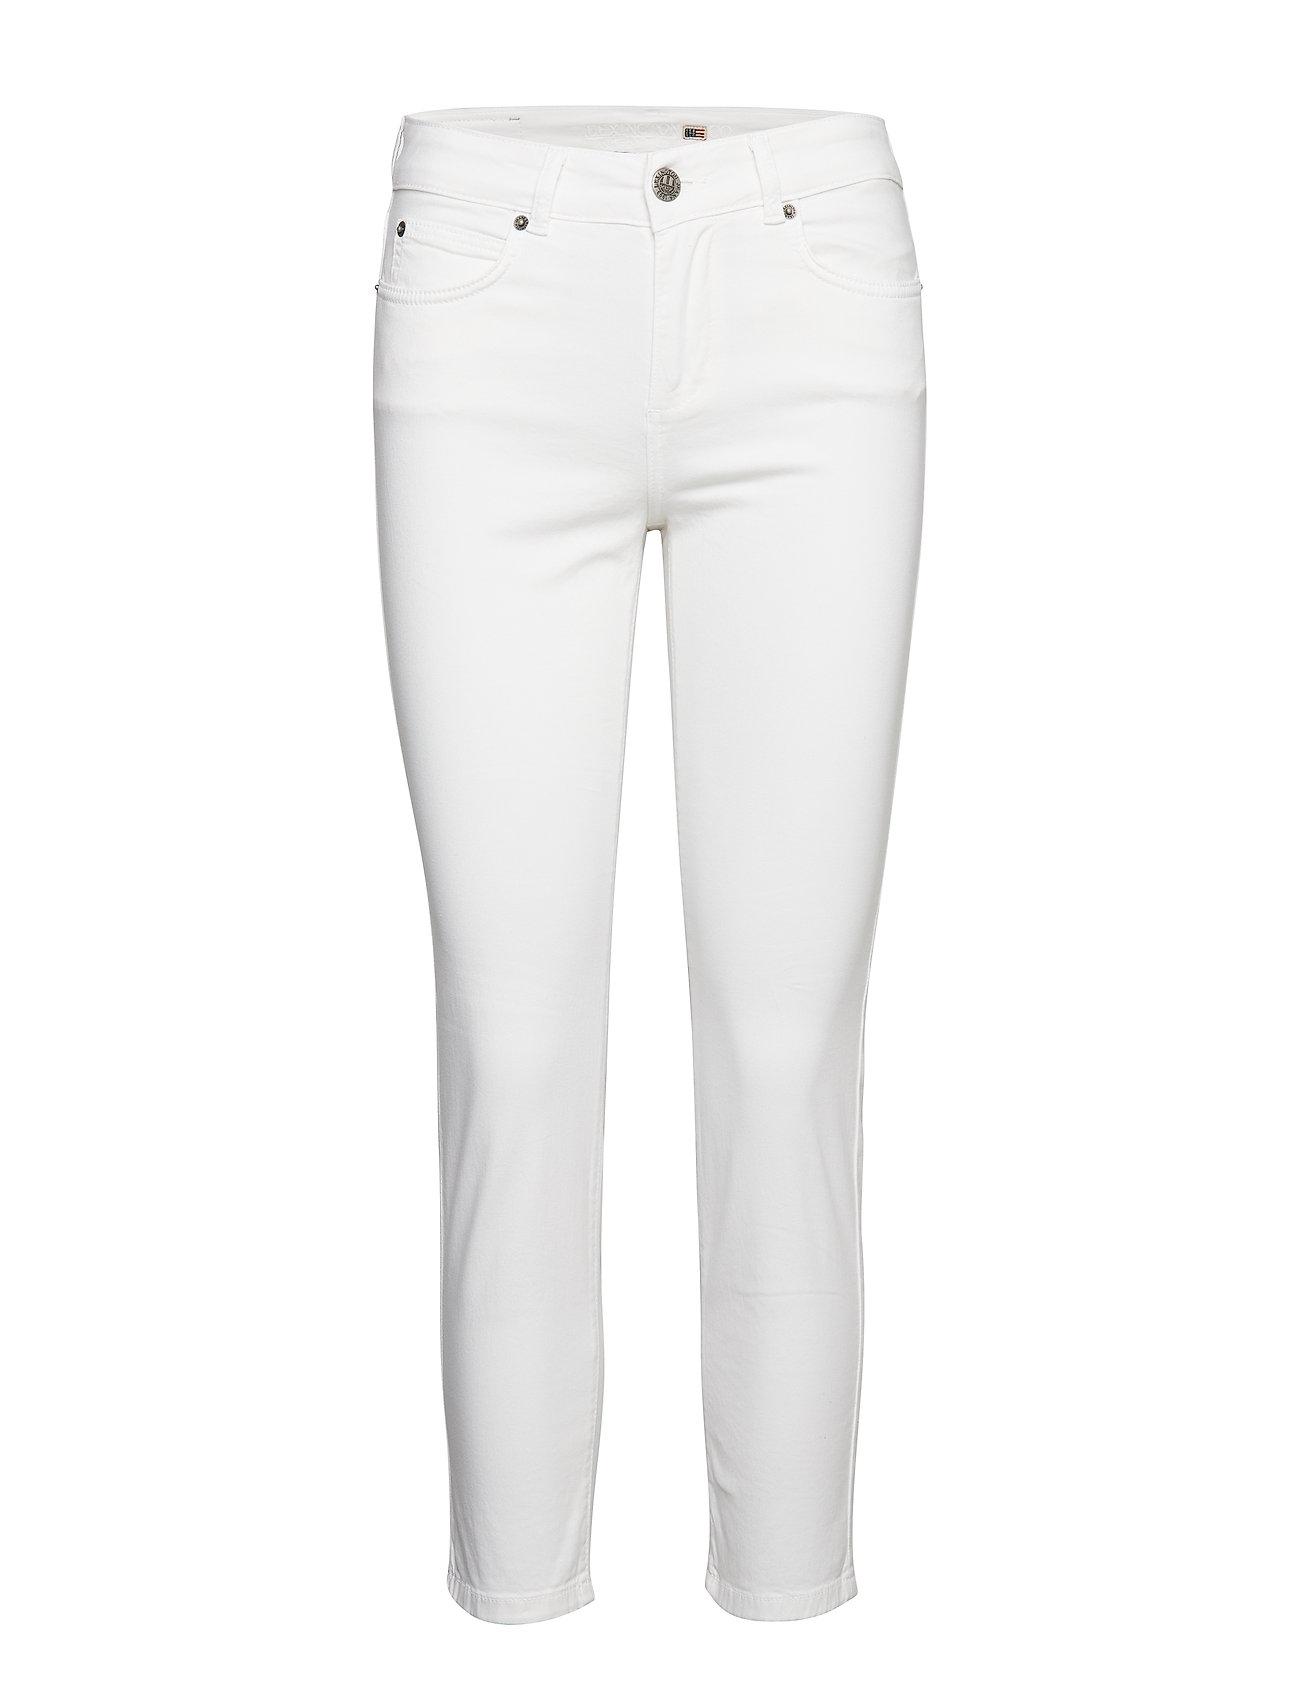 Lexington Clothing Zoe Solid Pants